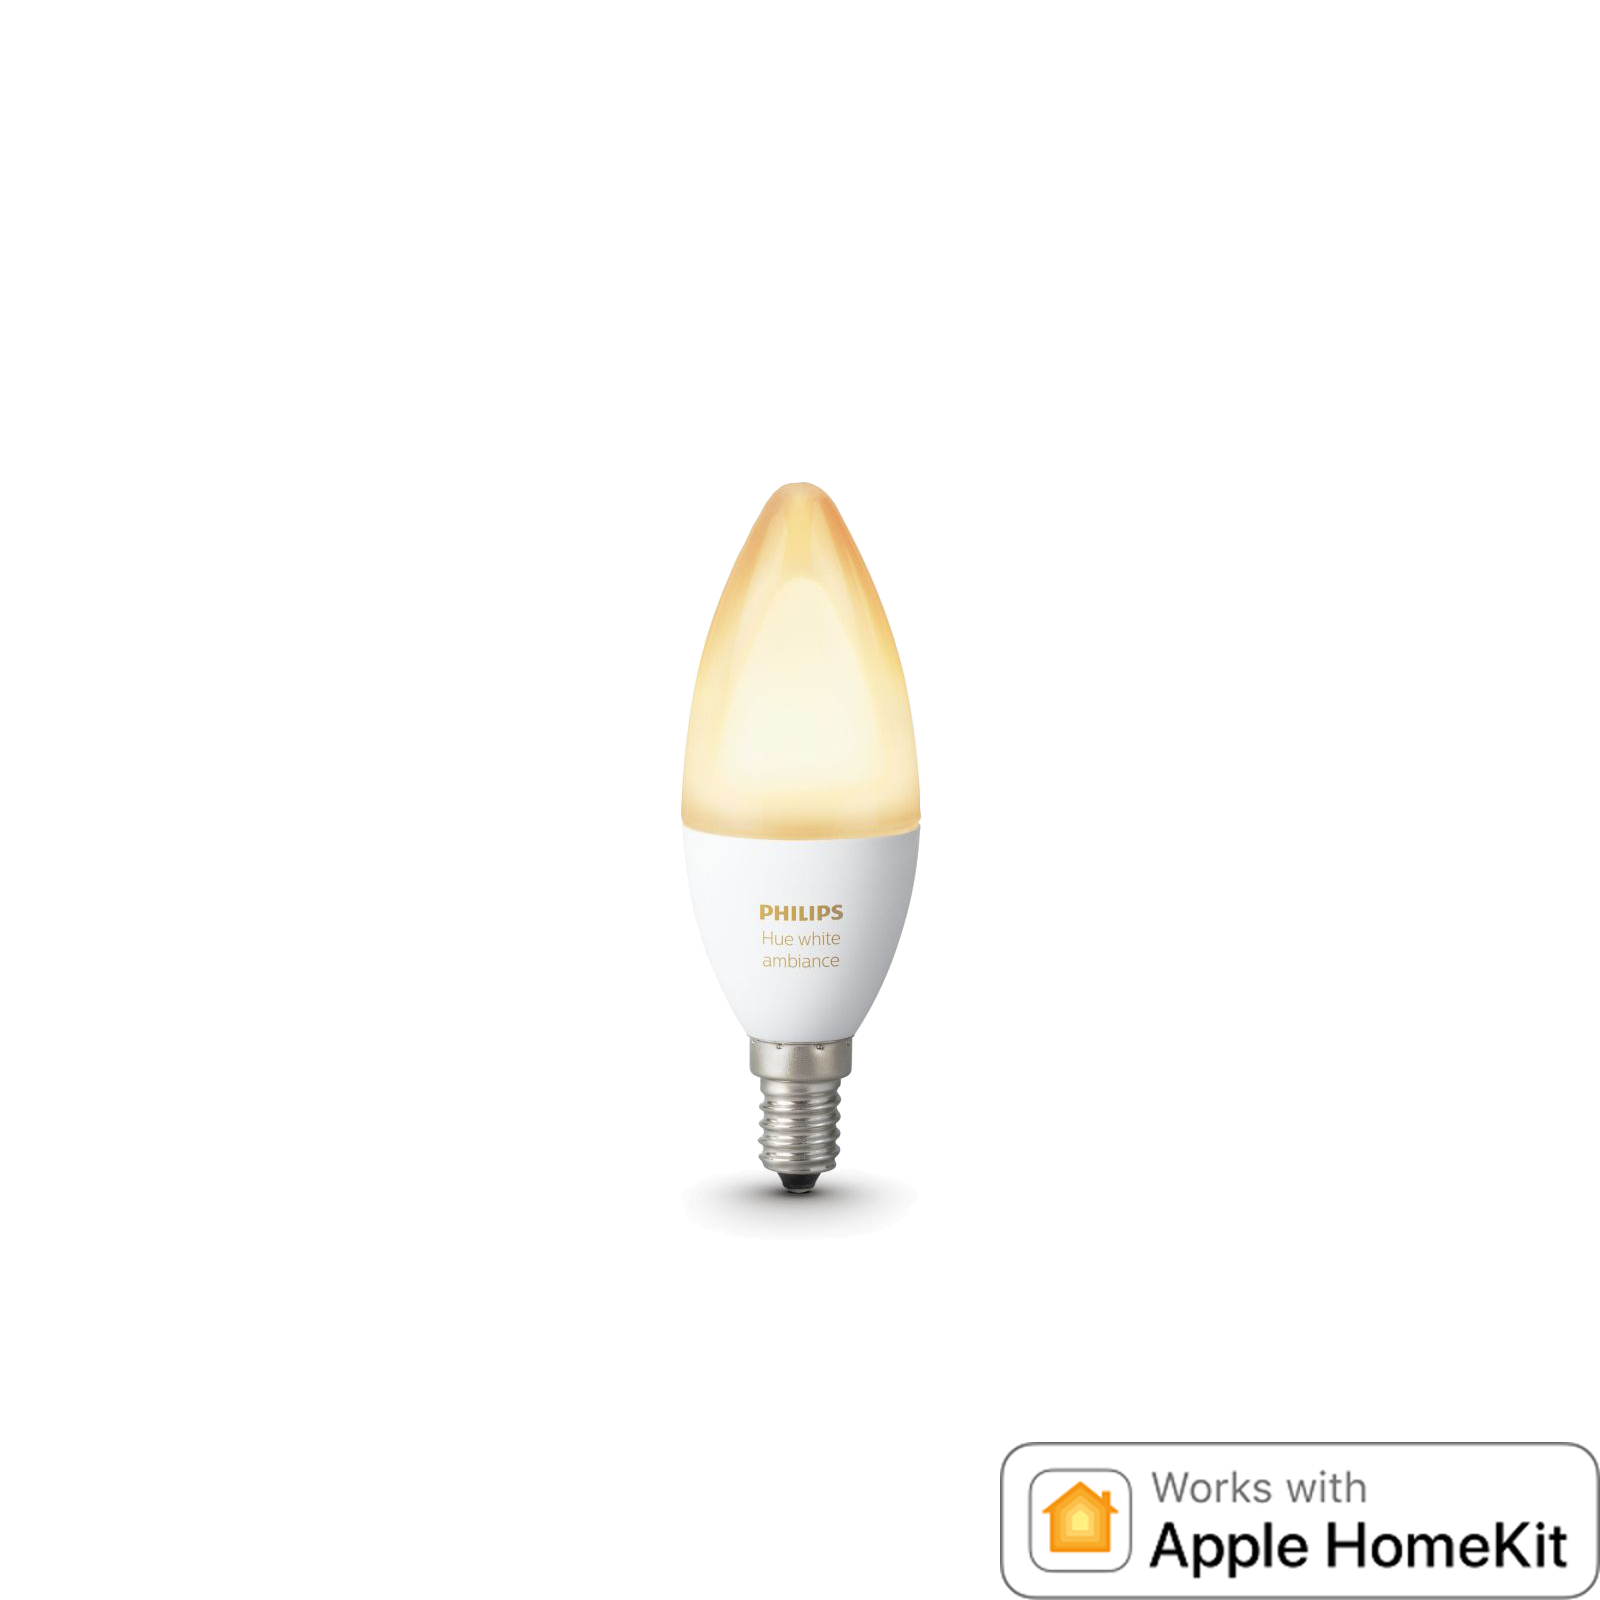 Philips Hue White Ambiance E14 Kerzenlampe